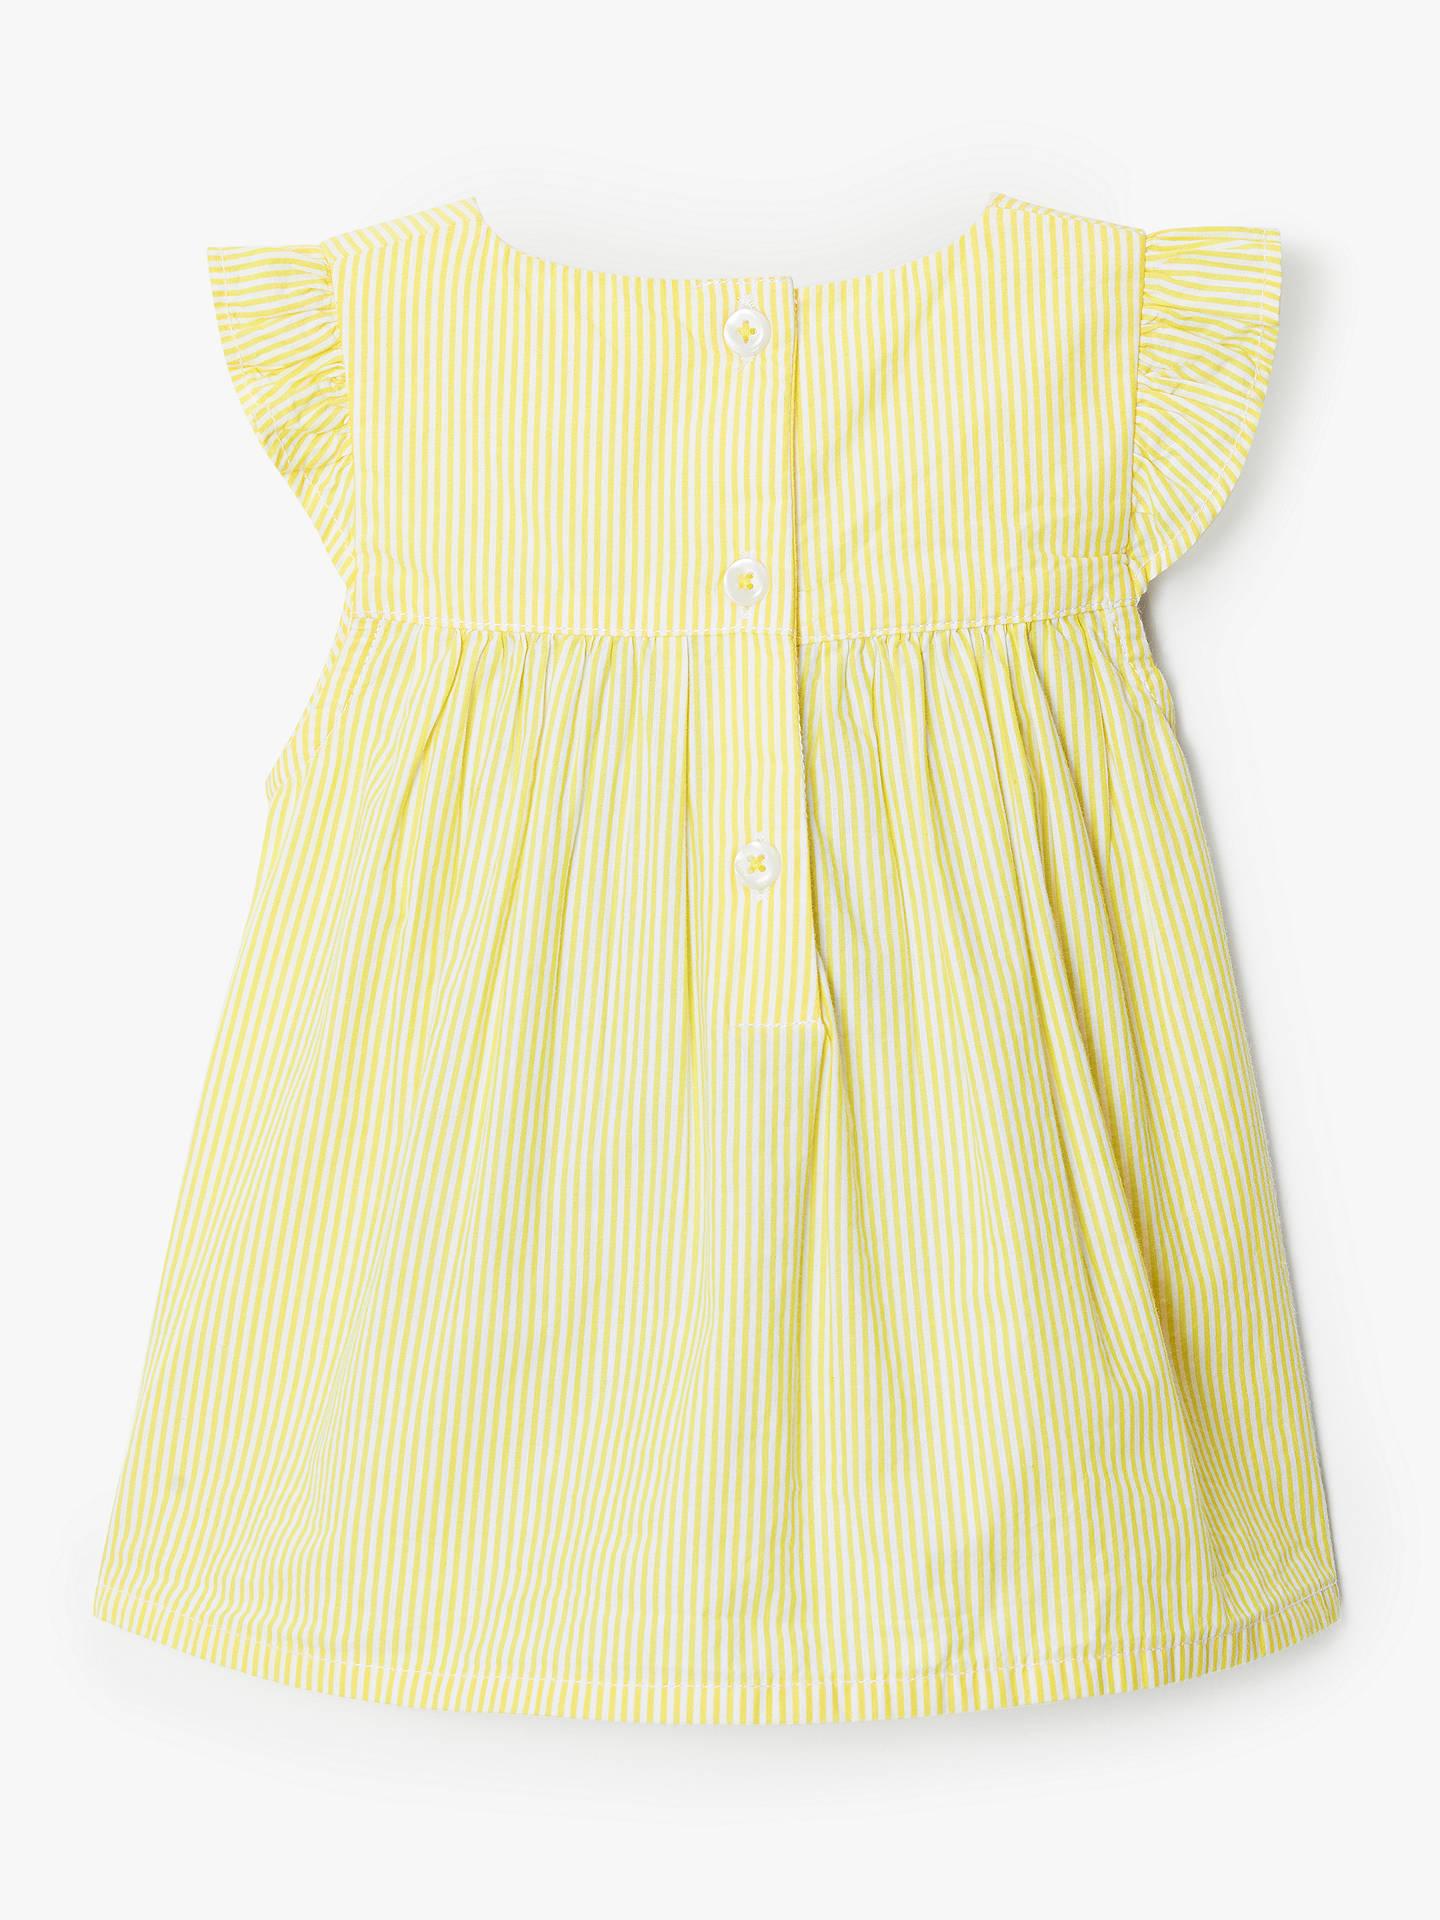 Girls' Clothing (newborn-5t) Dresses Popular Brand Dress Age 3-6mths John Lewis